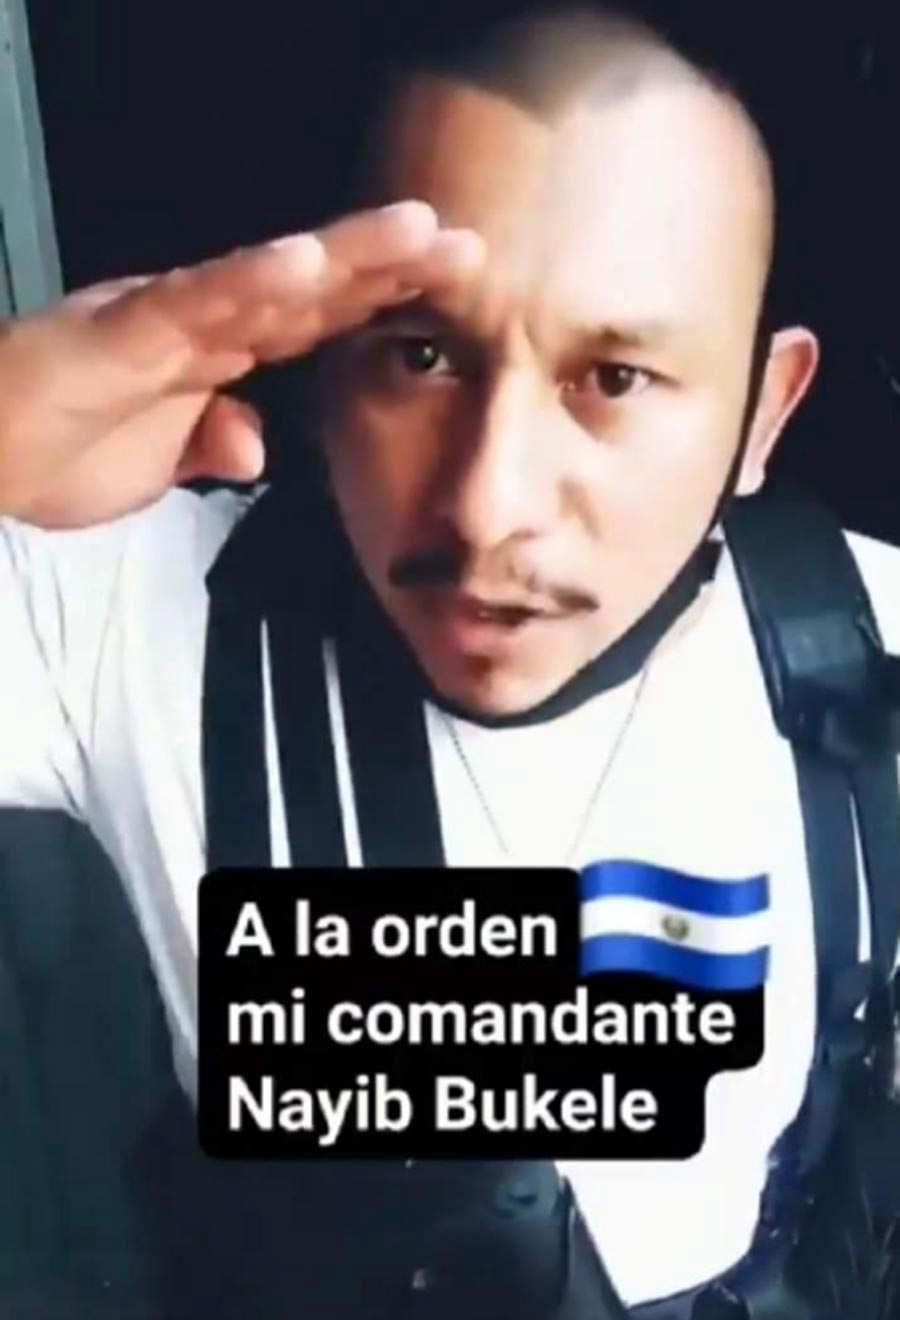 Aaron-Elias-Martinez-video-amenaza_10